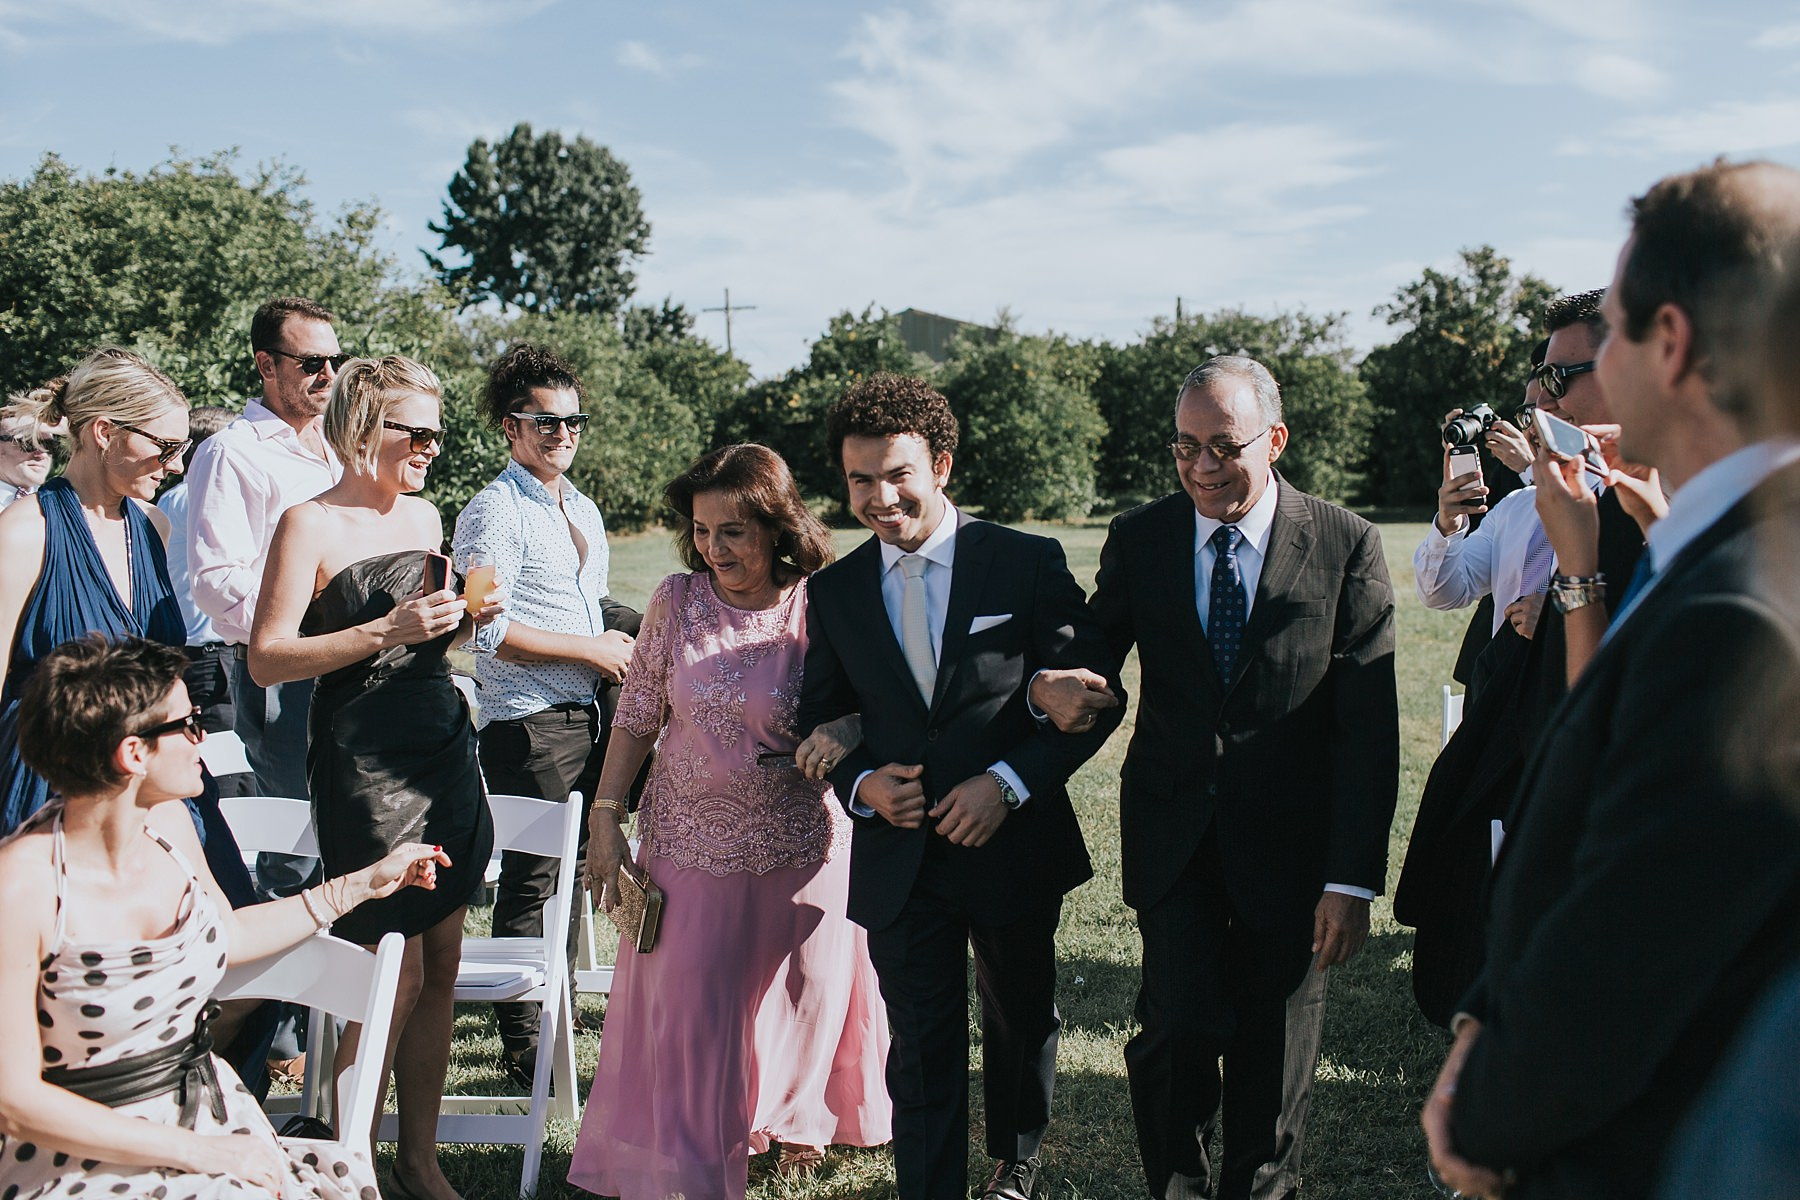 groom walking down the aisle to get married